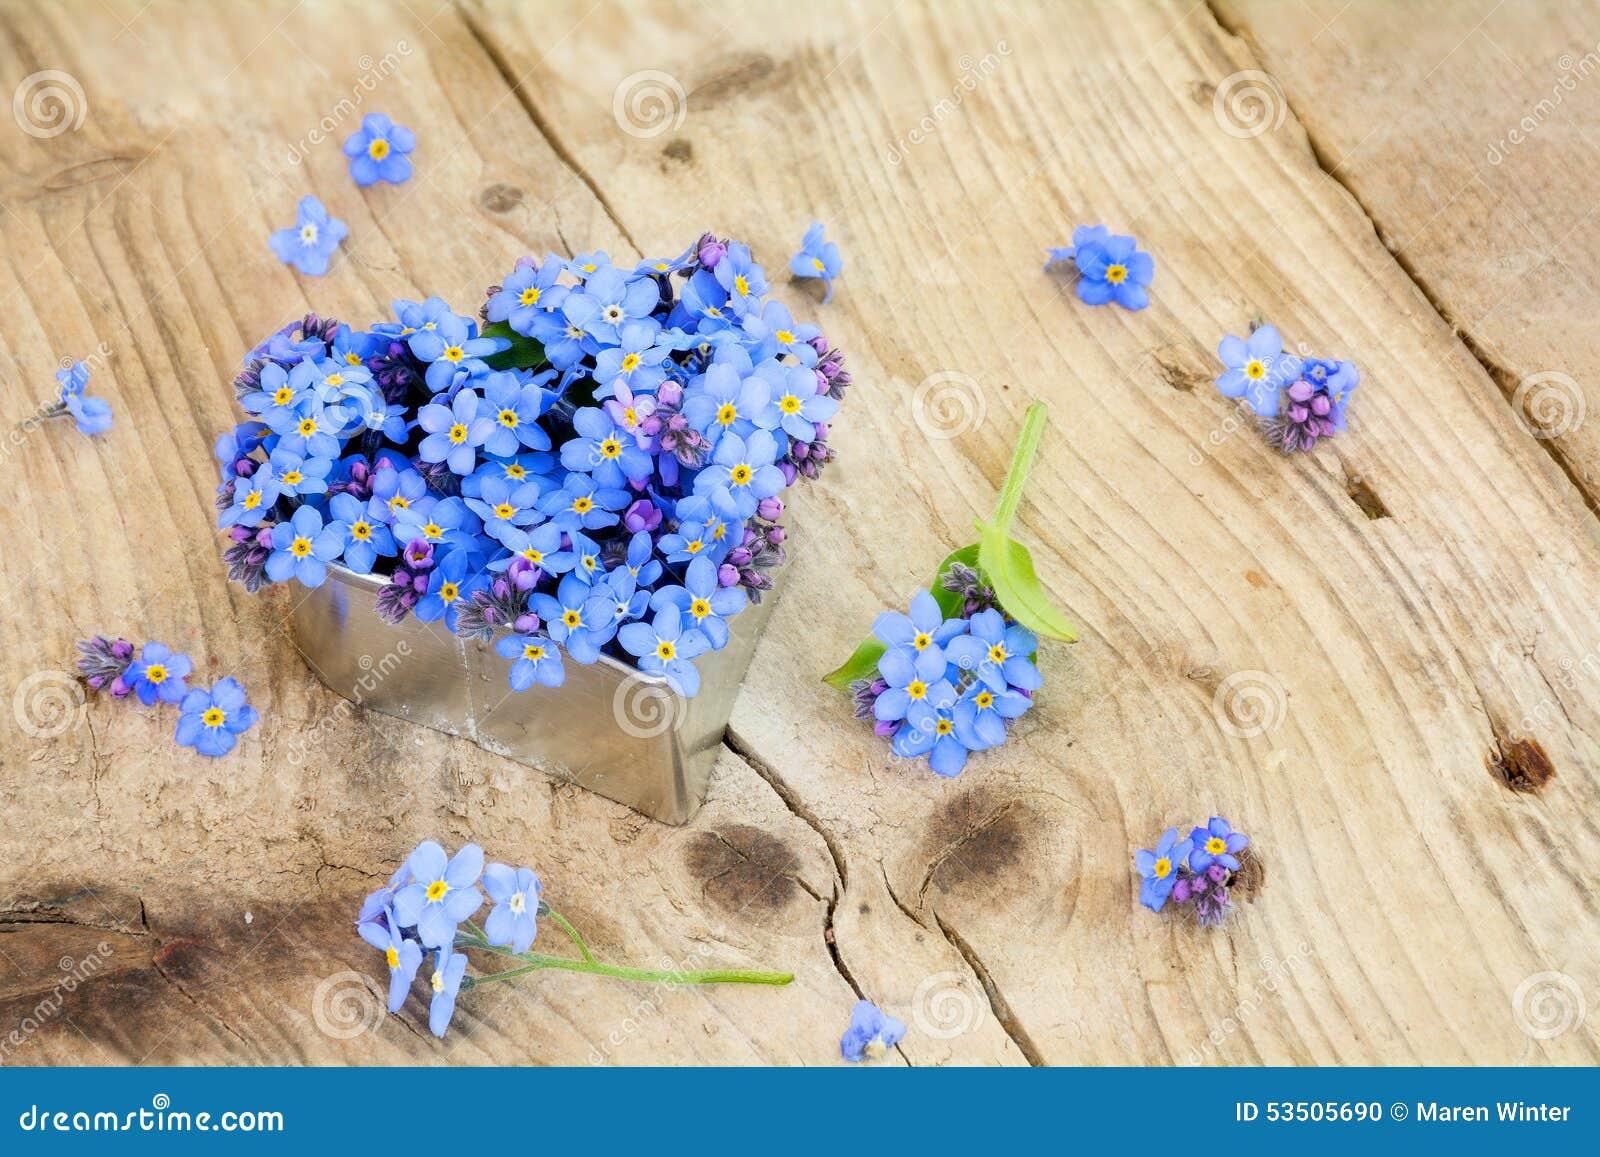 forget me not flowers heart the image. Black Bedroom Furniture Sets. Home Design Ideas